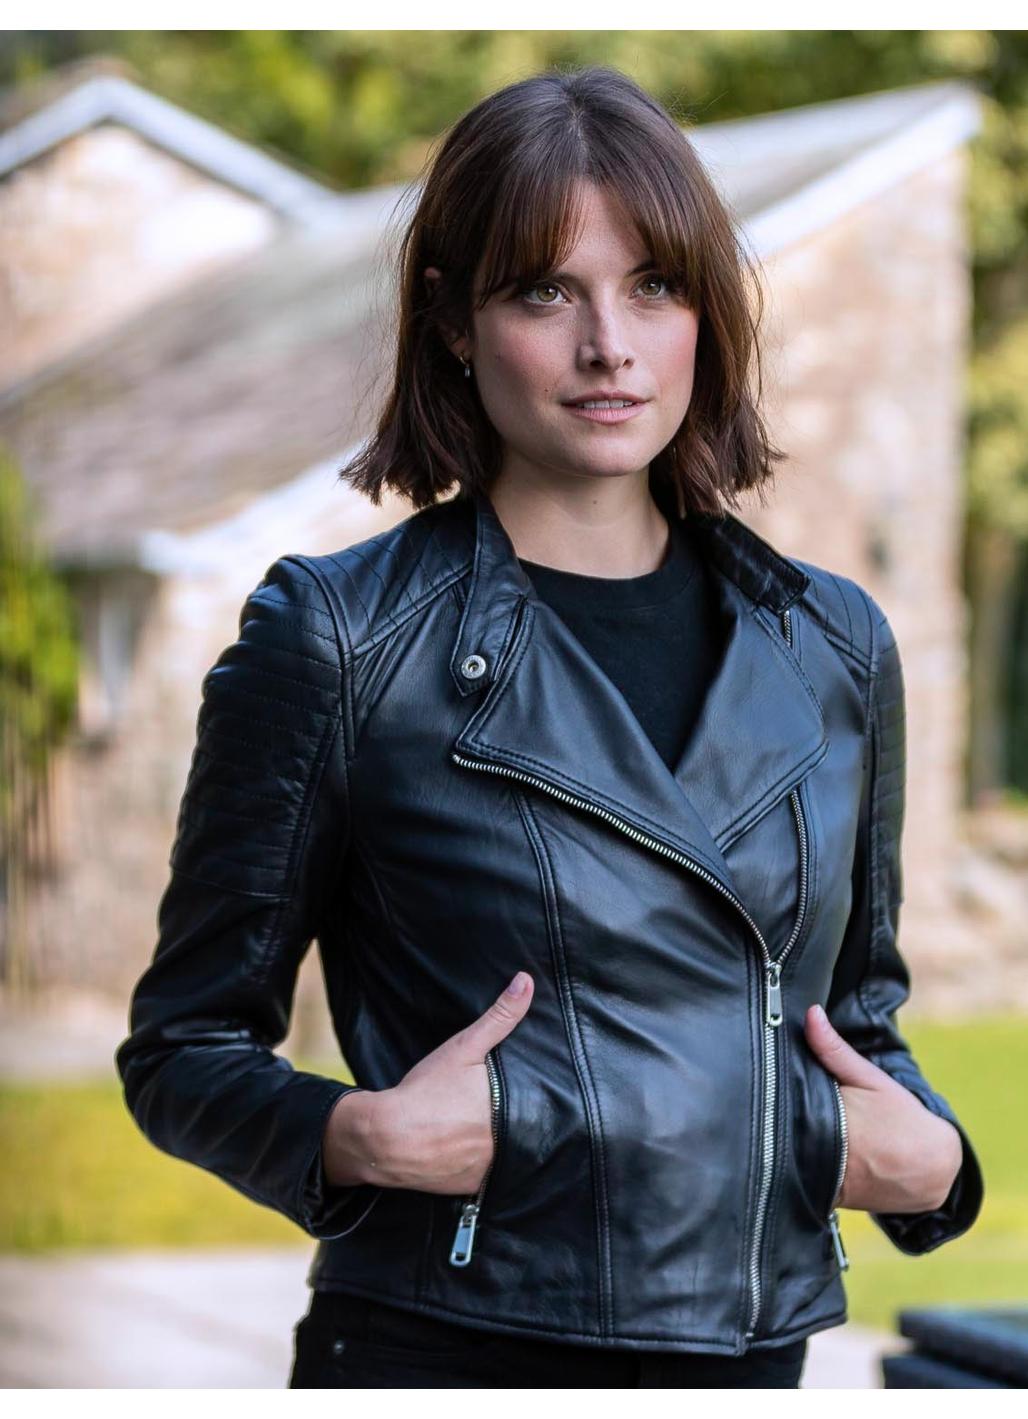 Nicole Leather Biker Jacket in Black